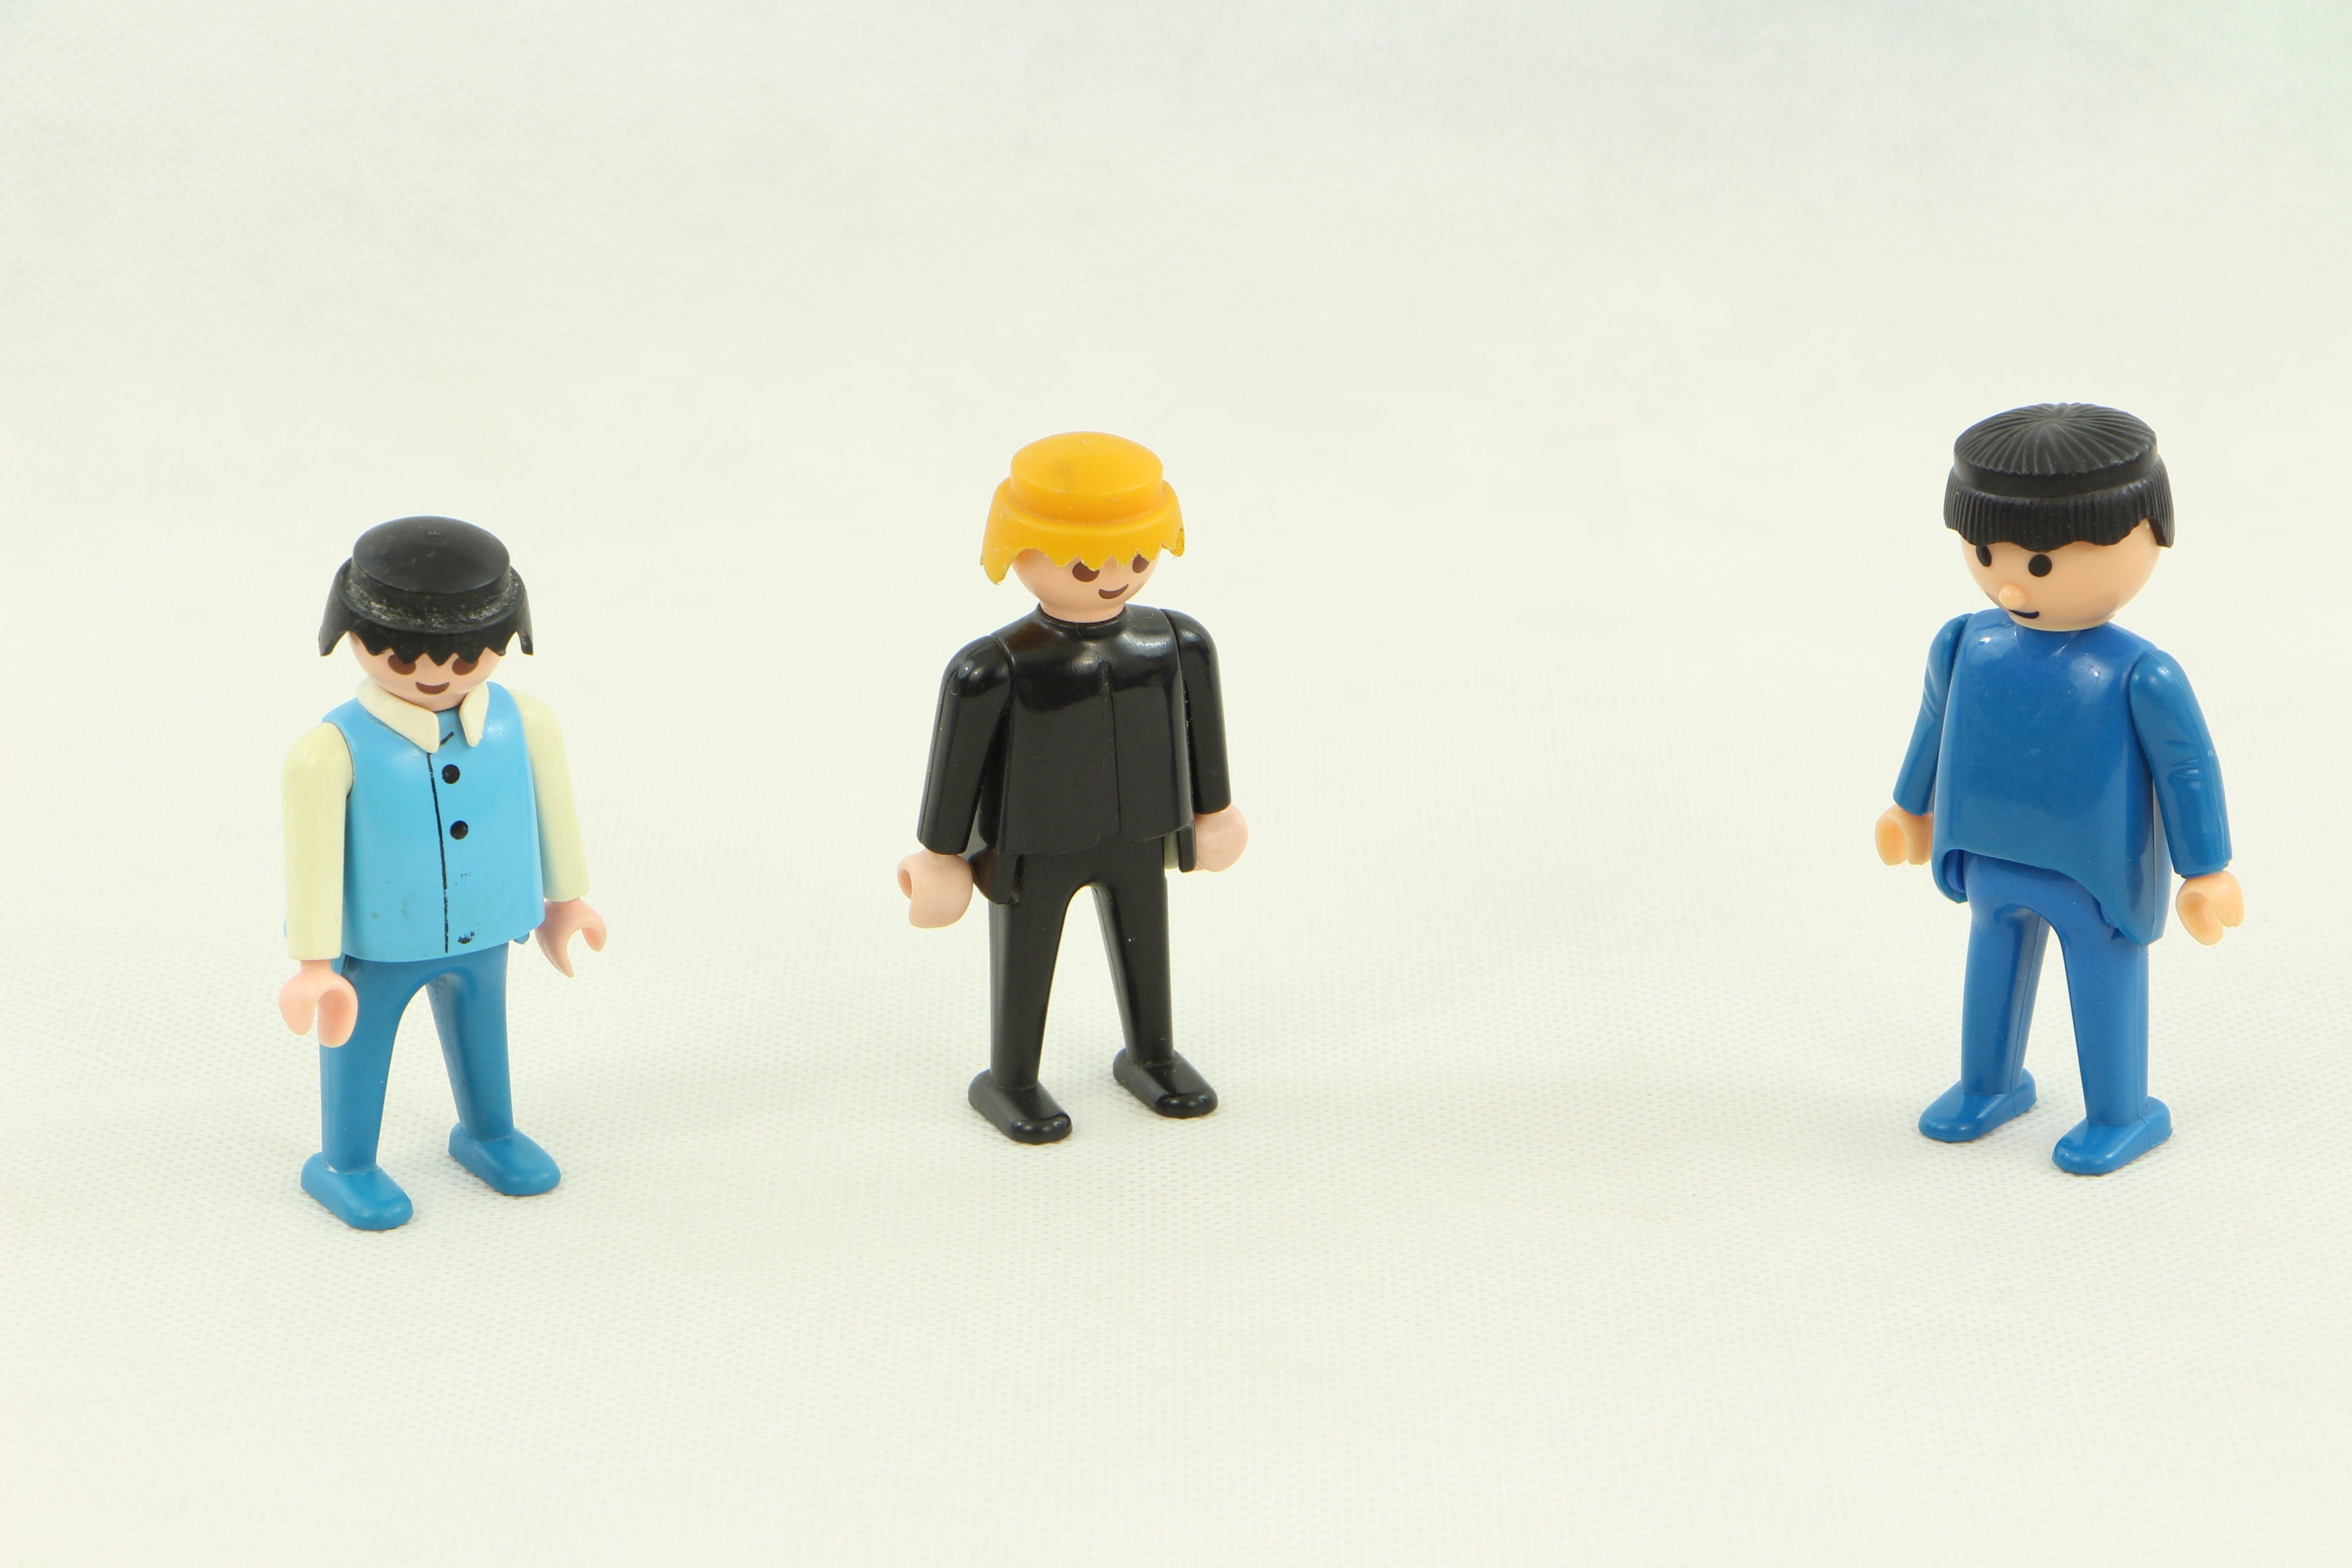 Free stock photo of business, meeting, lego, figurine